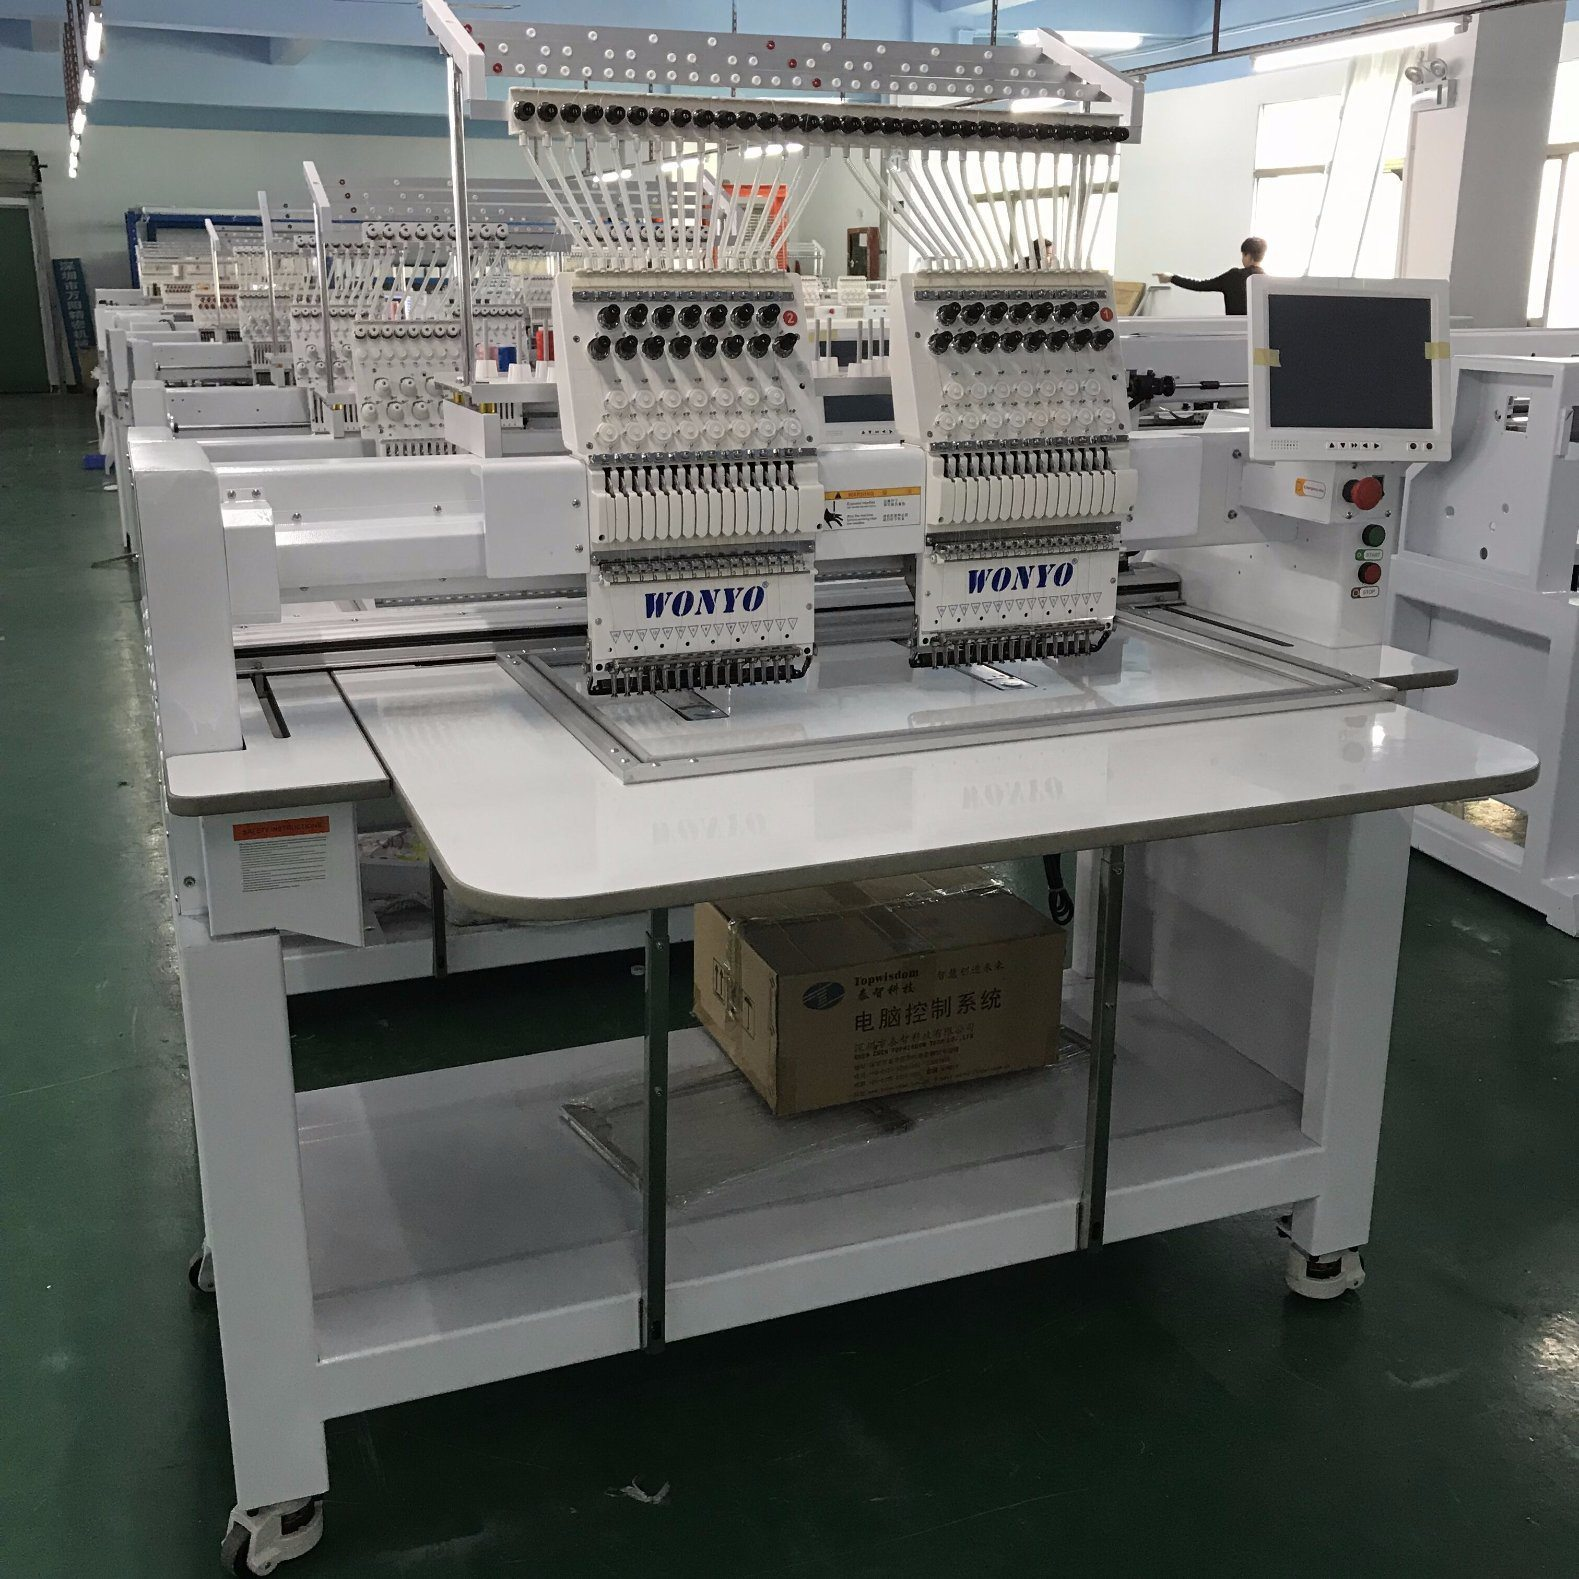 af16f7684c019 China New Model Wonyo 2 Heads Cap Embroidery Machine Parts - China ...